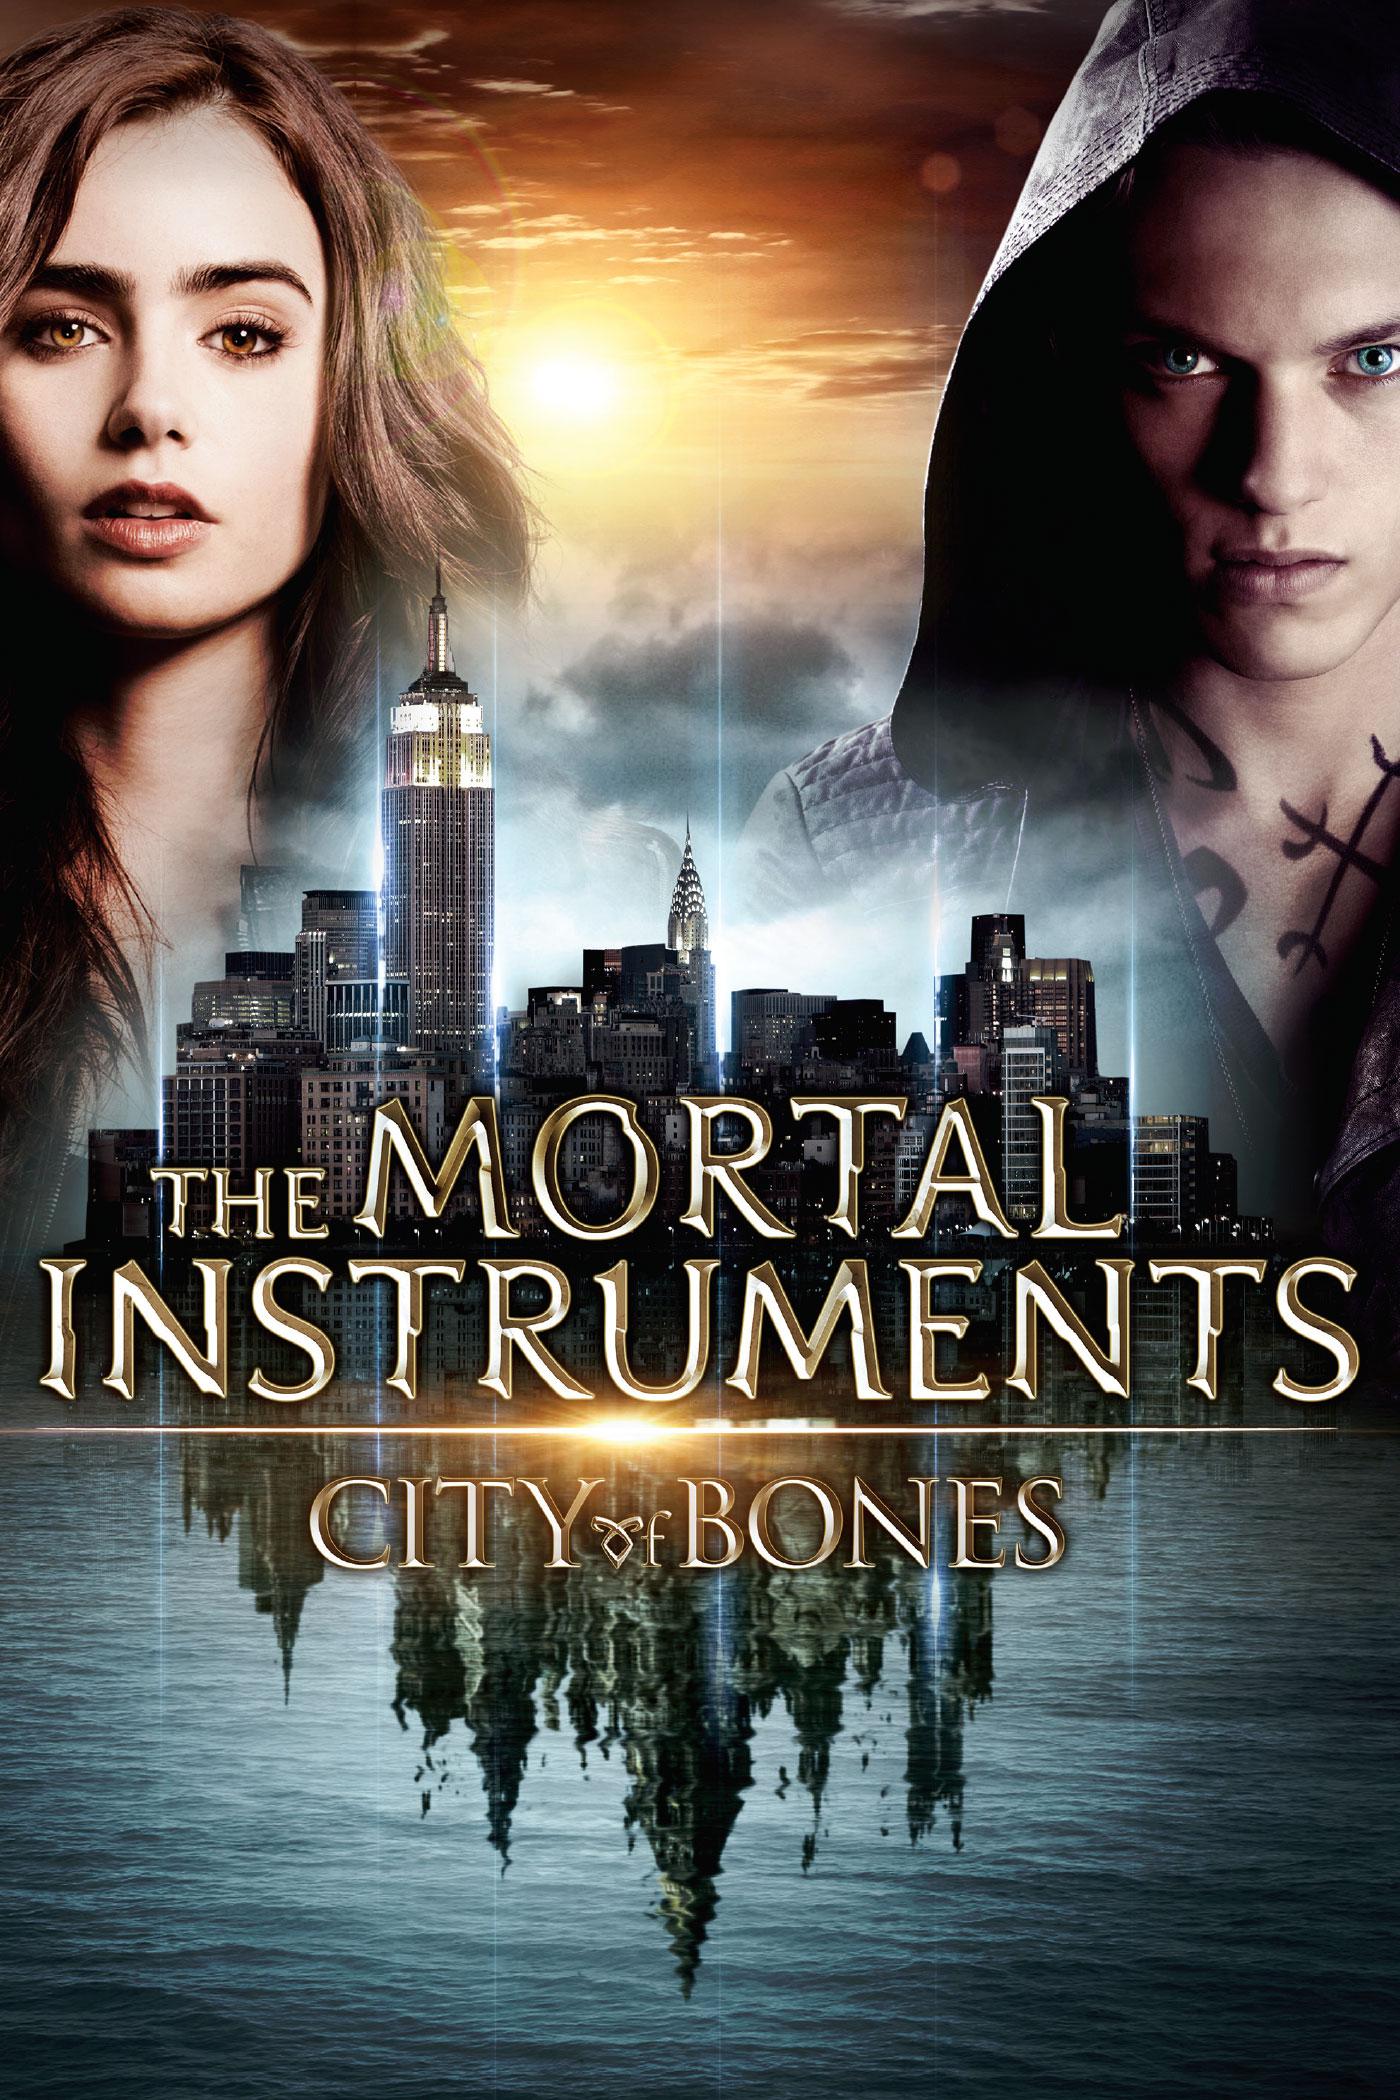 20. Mortal_Instruments_itunes_Movie.jpg